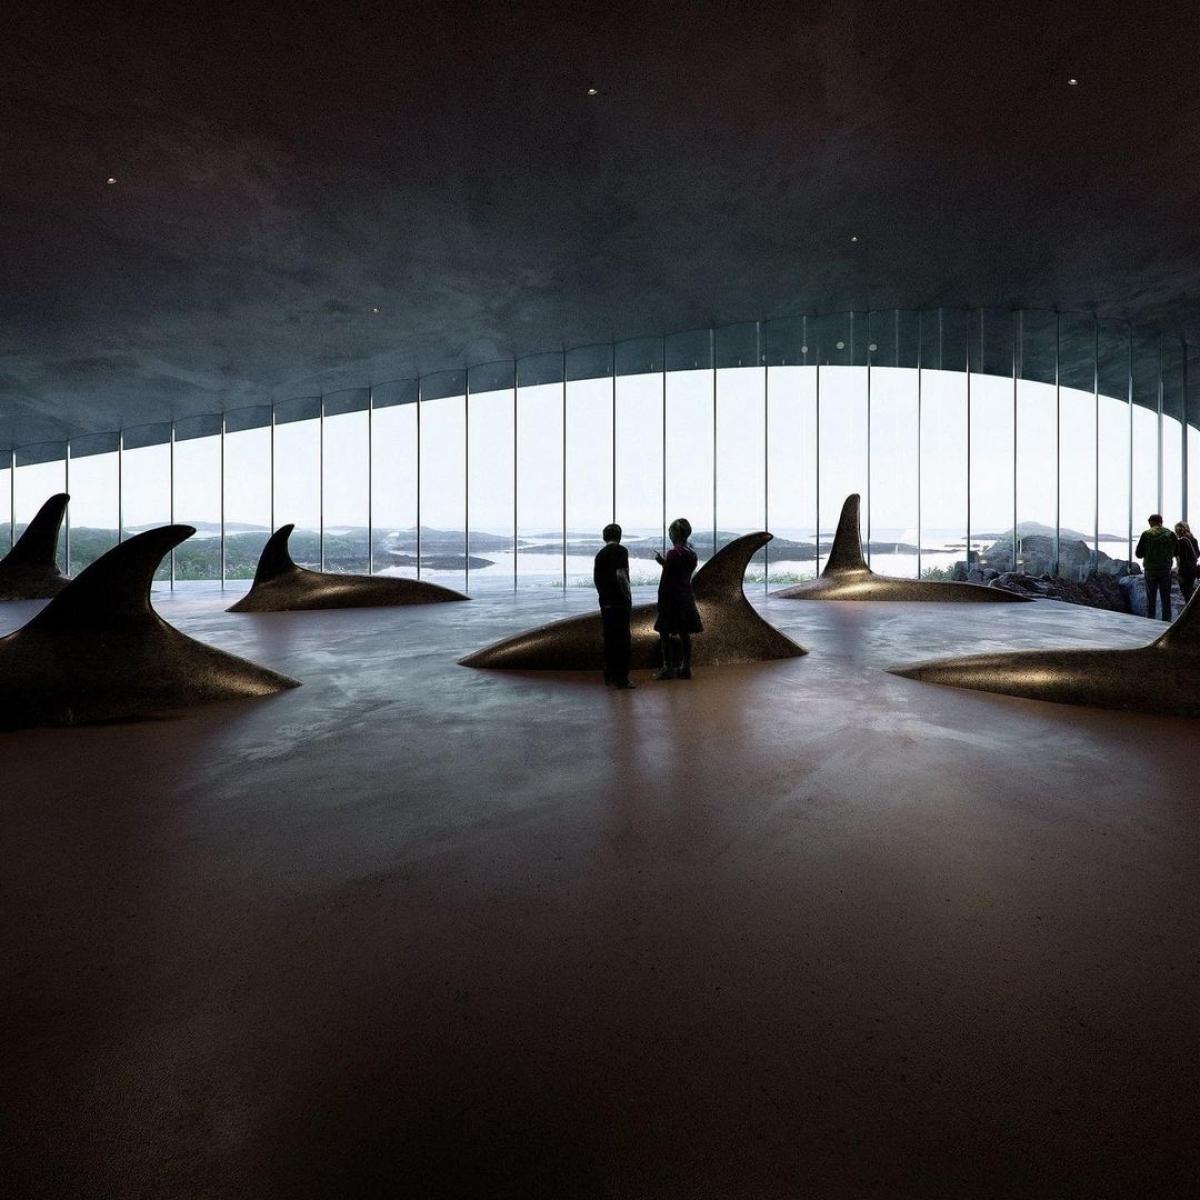 Nguồn:The Whale/Dorte Mandrup